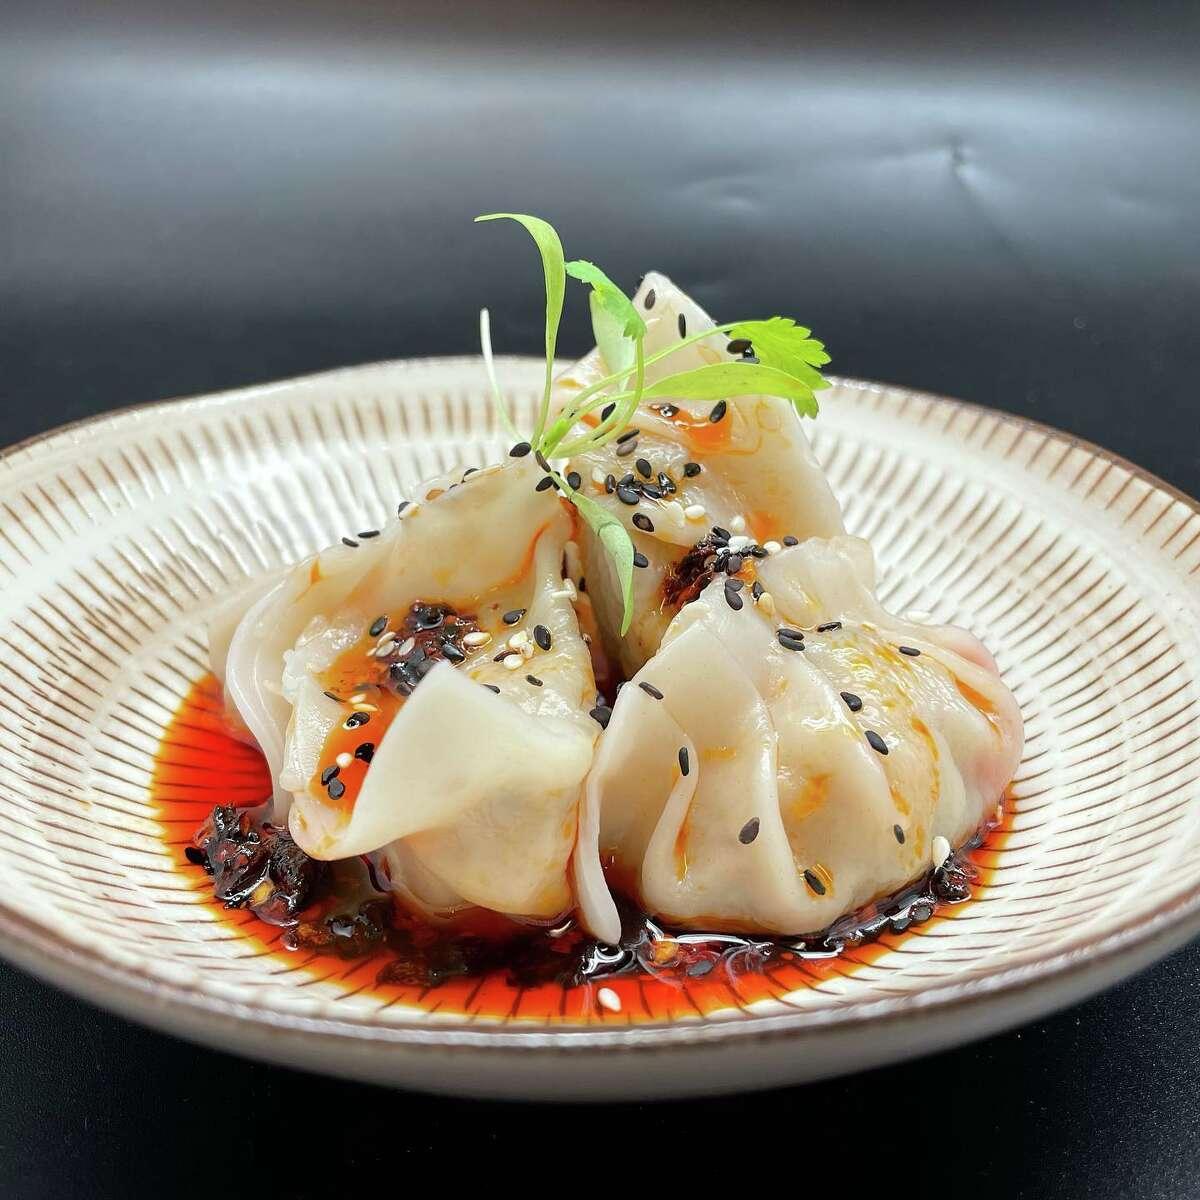 Szechuan dumplings from Little Dumpling House in Westport